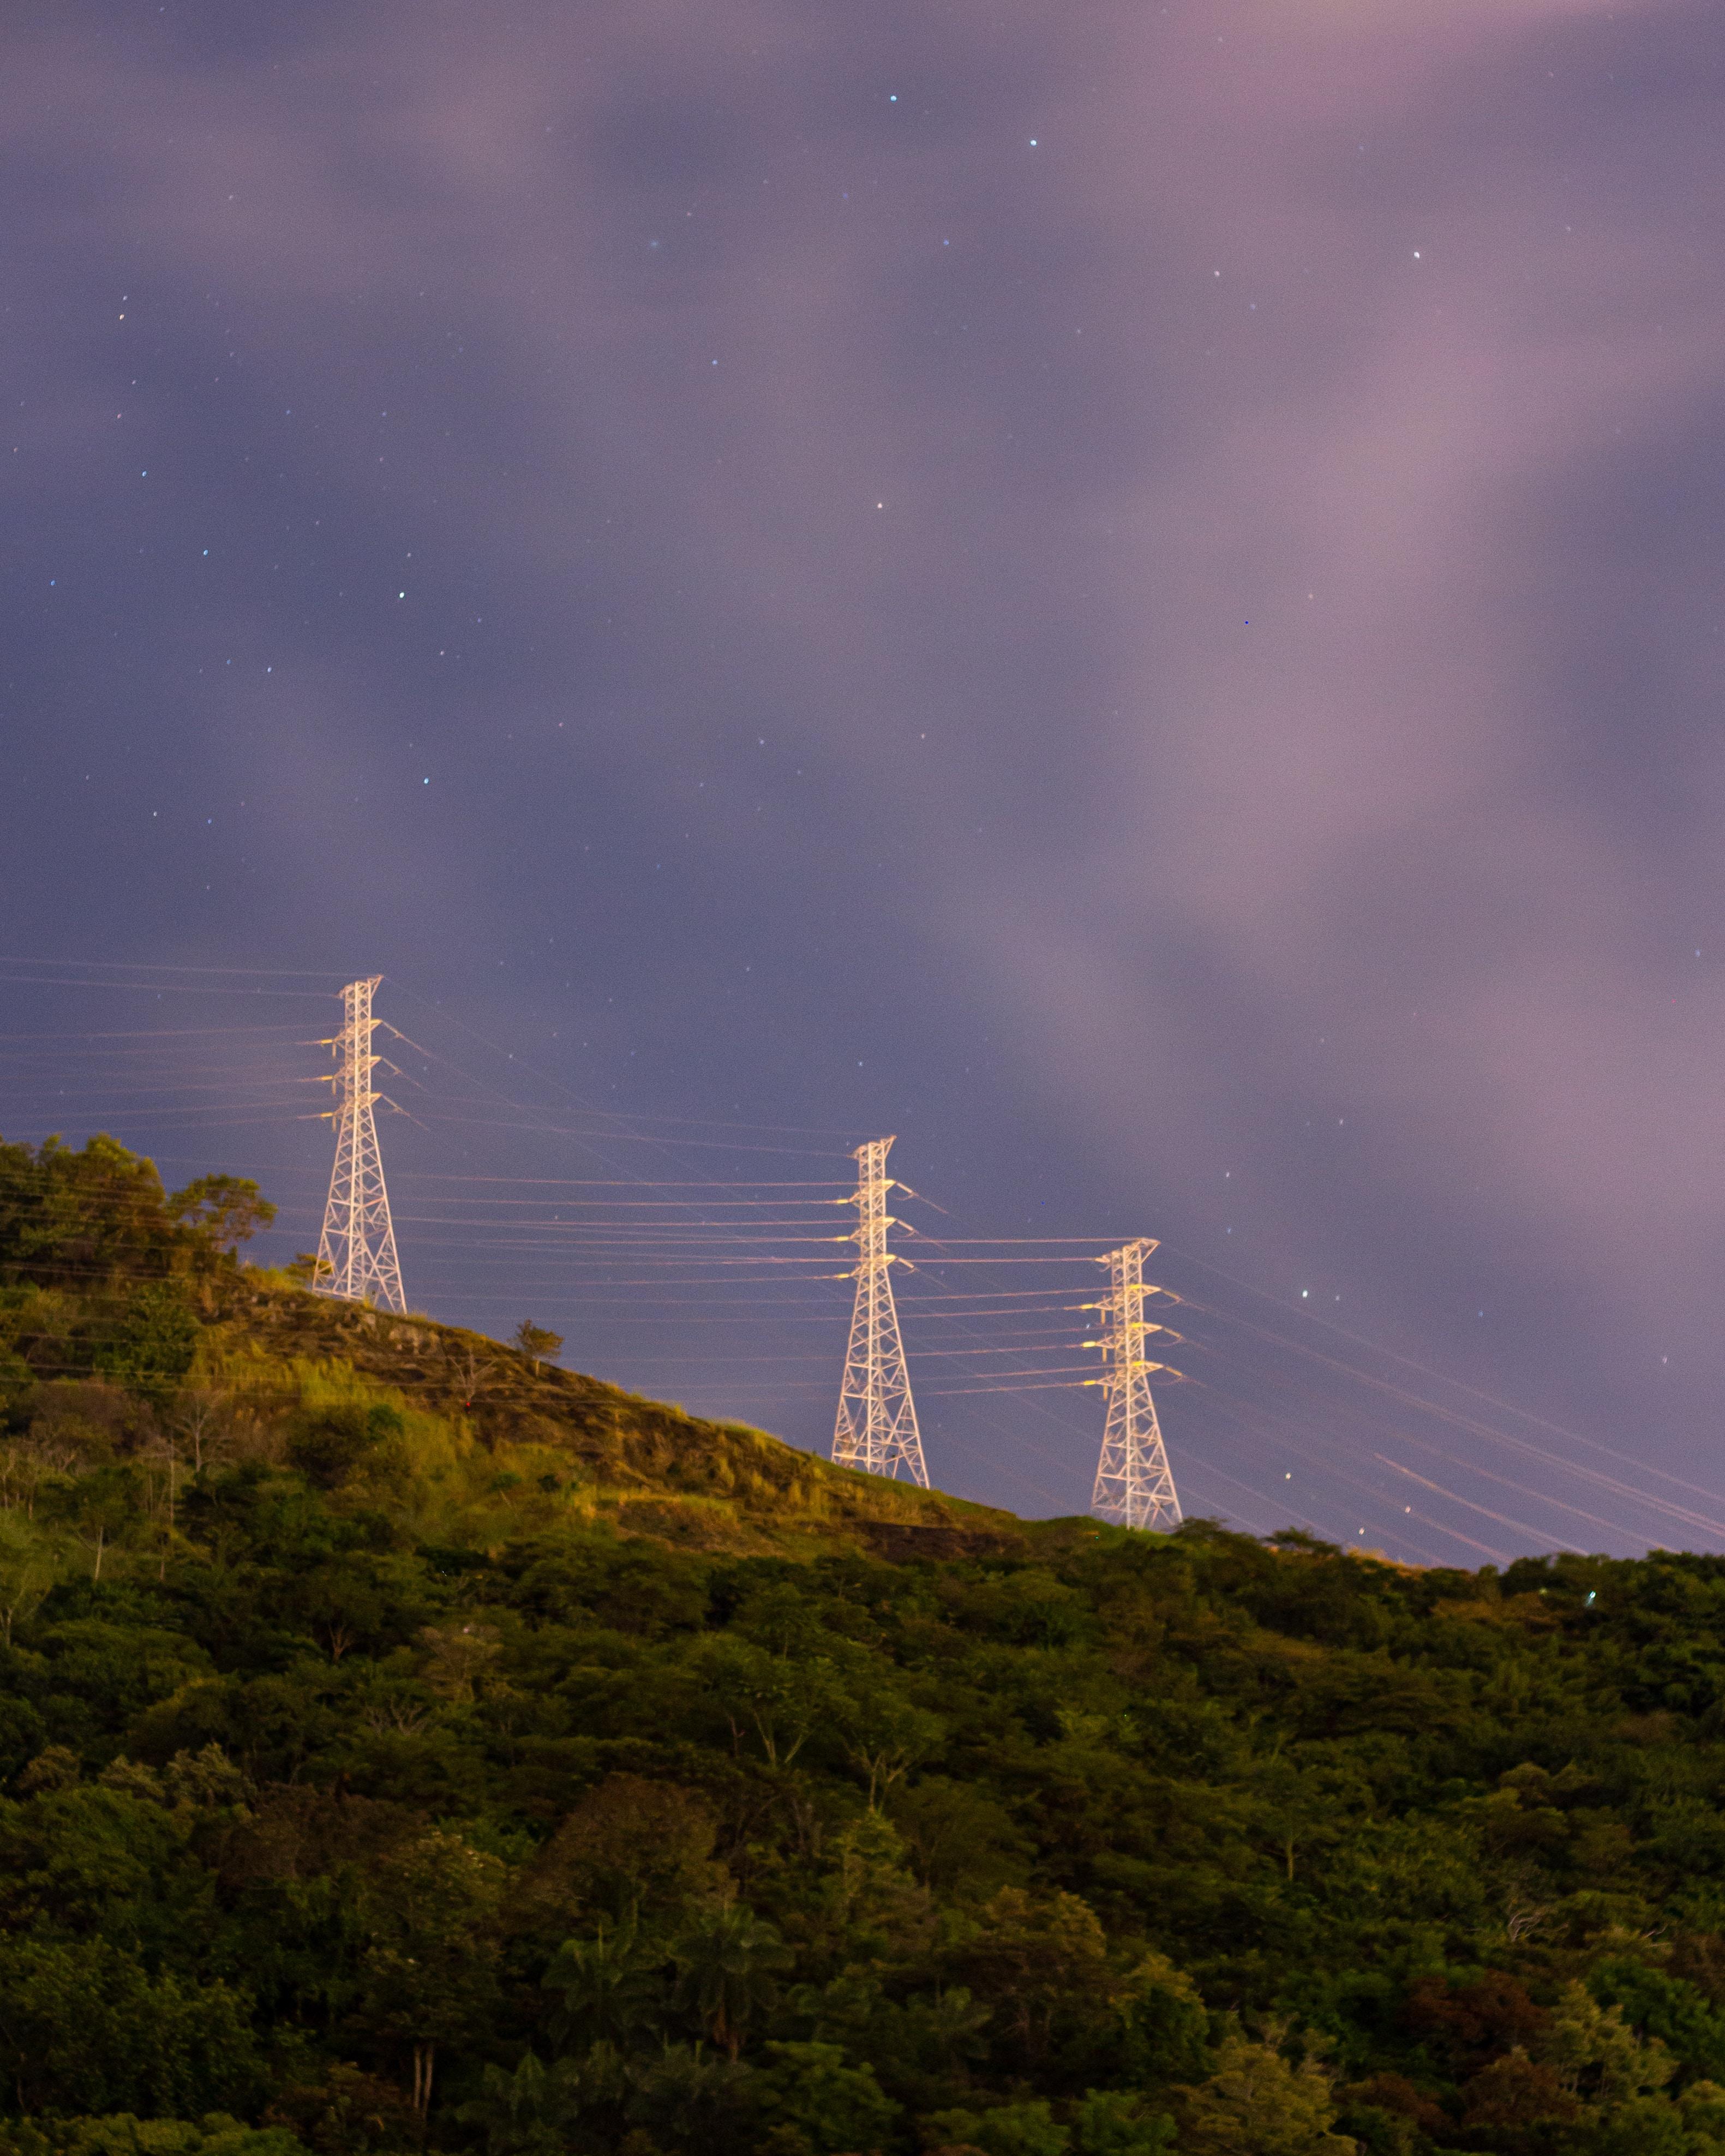 Overhead power line at night